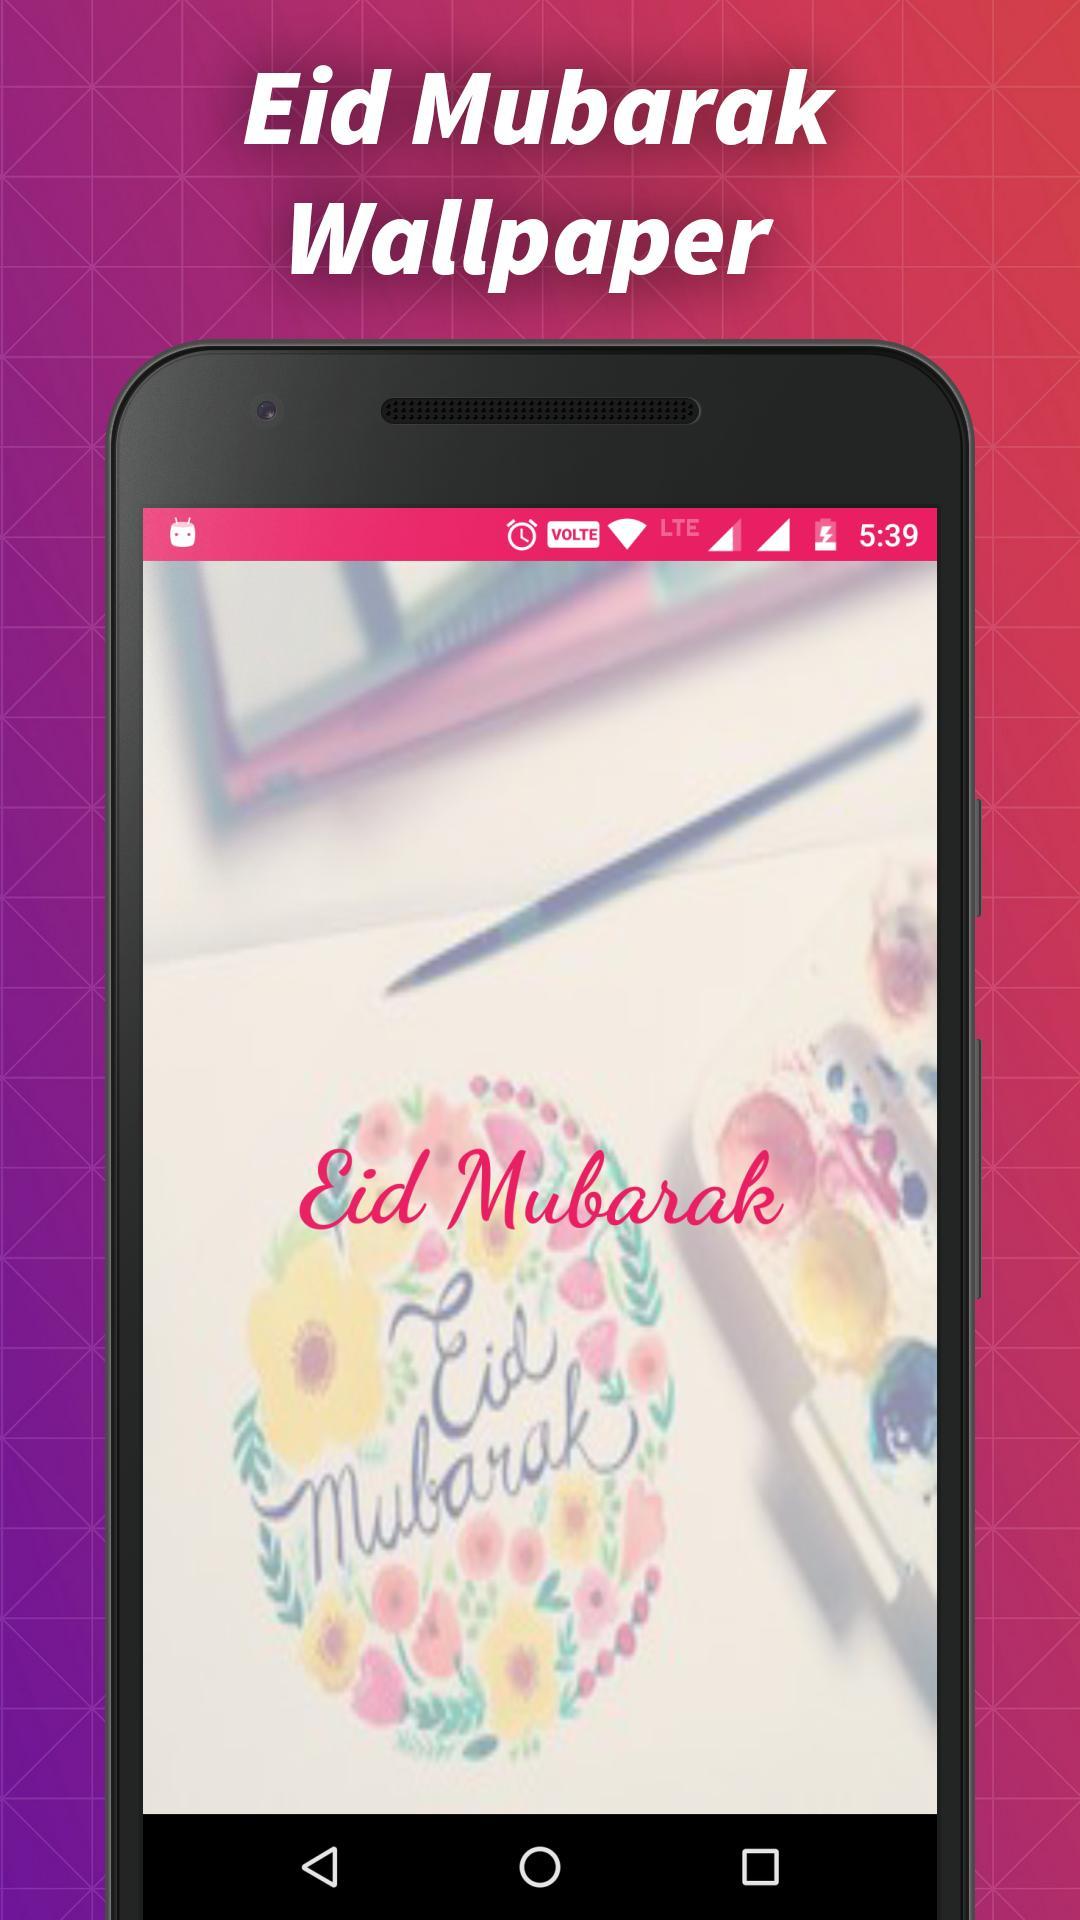 Eid Mubarak Hd Wallpaper poster